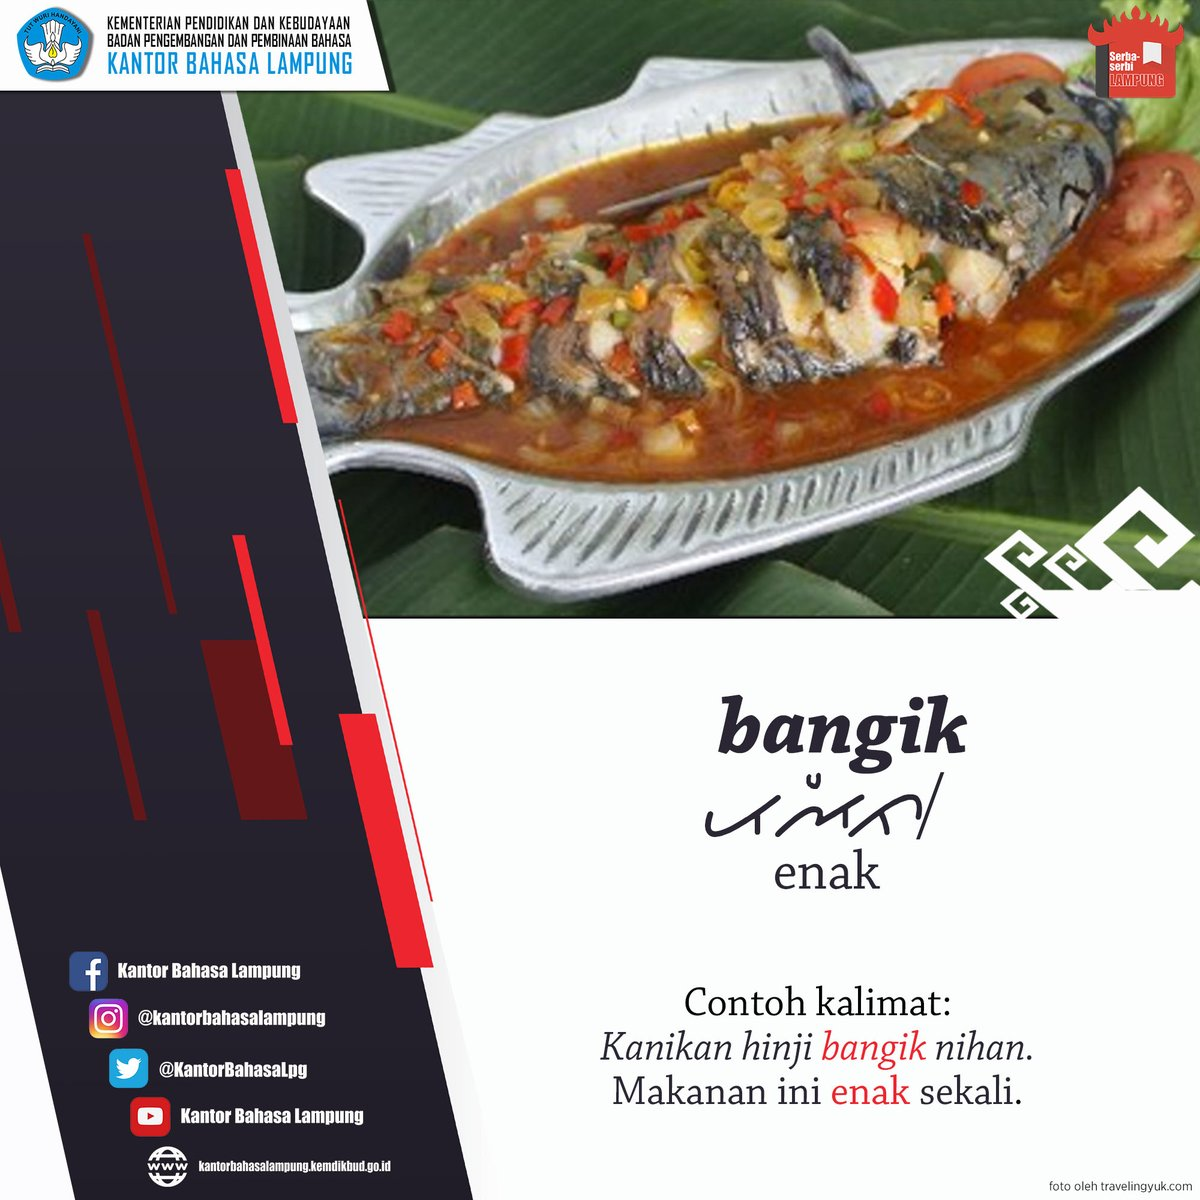 Halo, #SahabatBahasa tabik pun! Kali ini Serba-serbi Lampung membahas kata 'enak' dalam bahasa Lampung.  Nah, kalau 'enak'' dalam bahasa daerah kalian apa? Sebutkan di kolom komentar ya! #serbaserbilampung #bahasaIndonesia #bahasadaerah #lampung #bangik #kantorbahasalampungpic.twitter.com/K4uqEoycrG